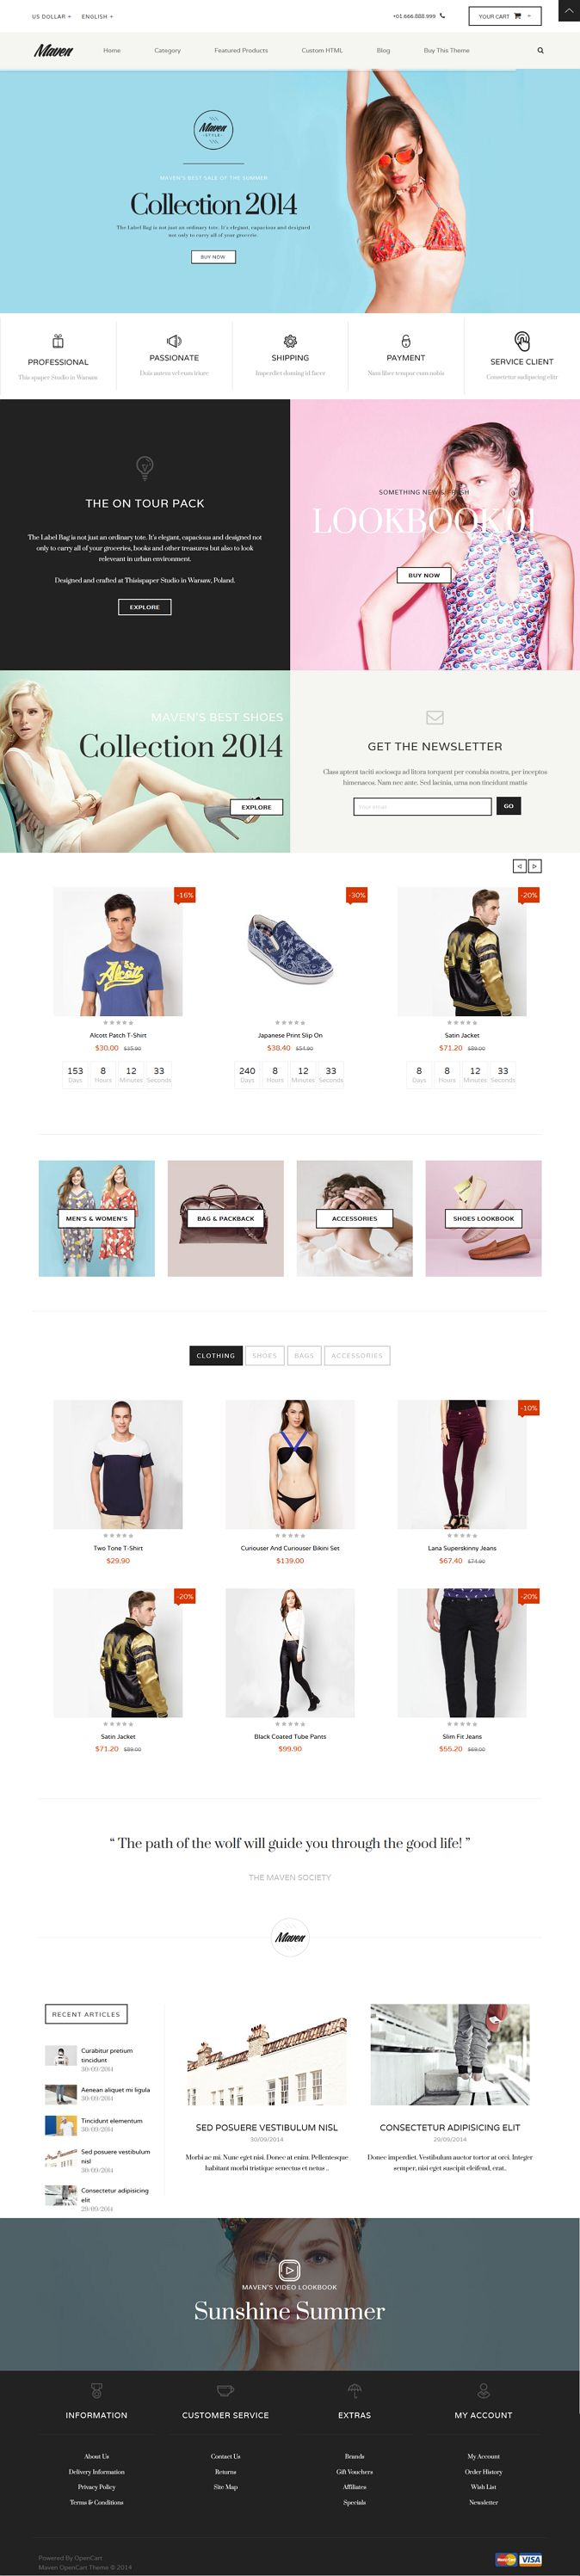 500 best layouts design images by rachelle clinton on pinterest